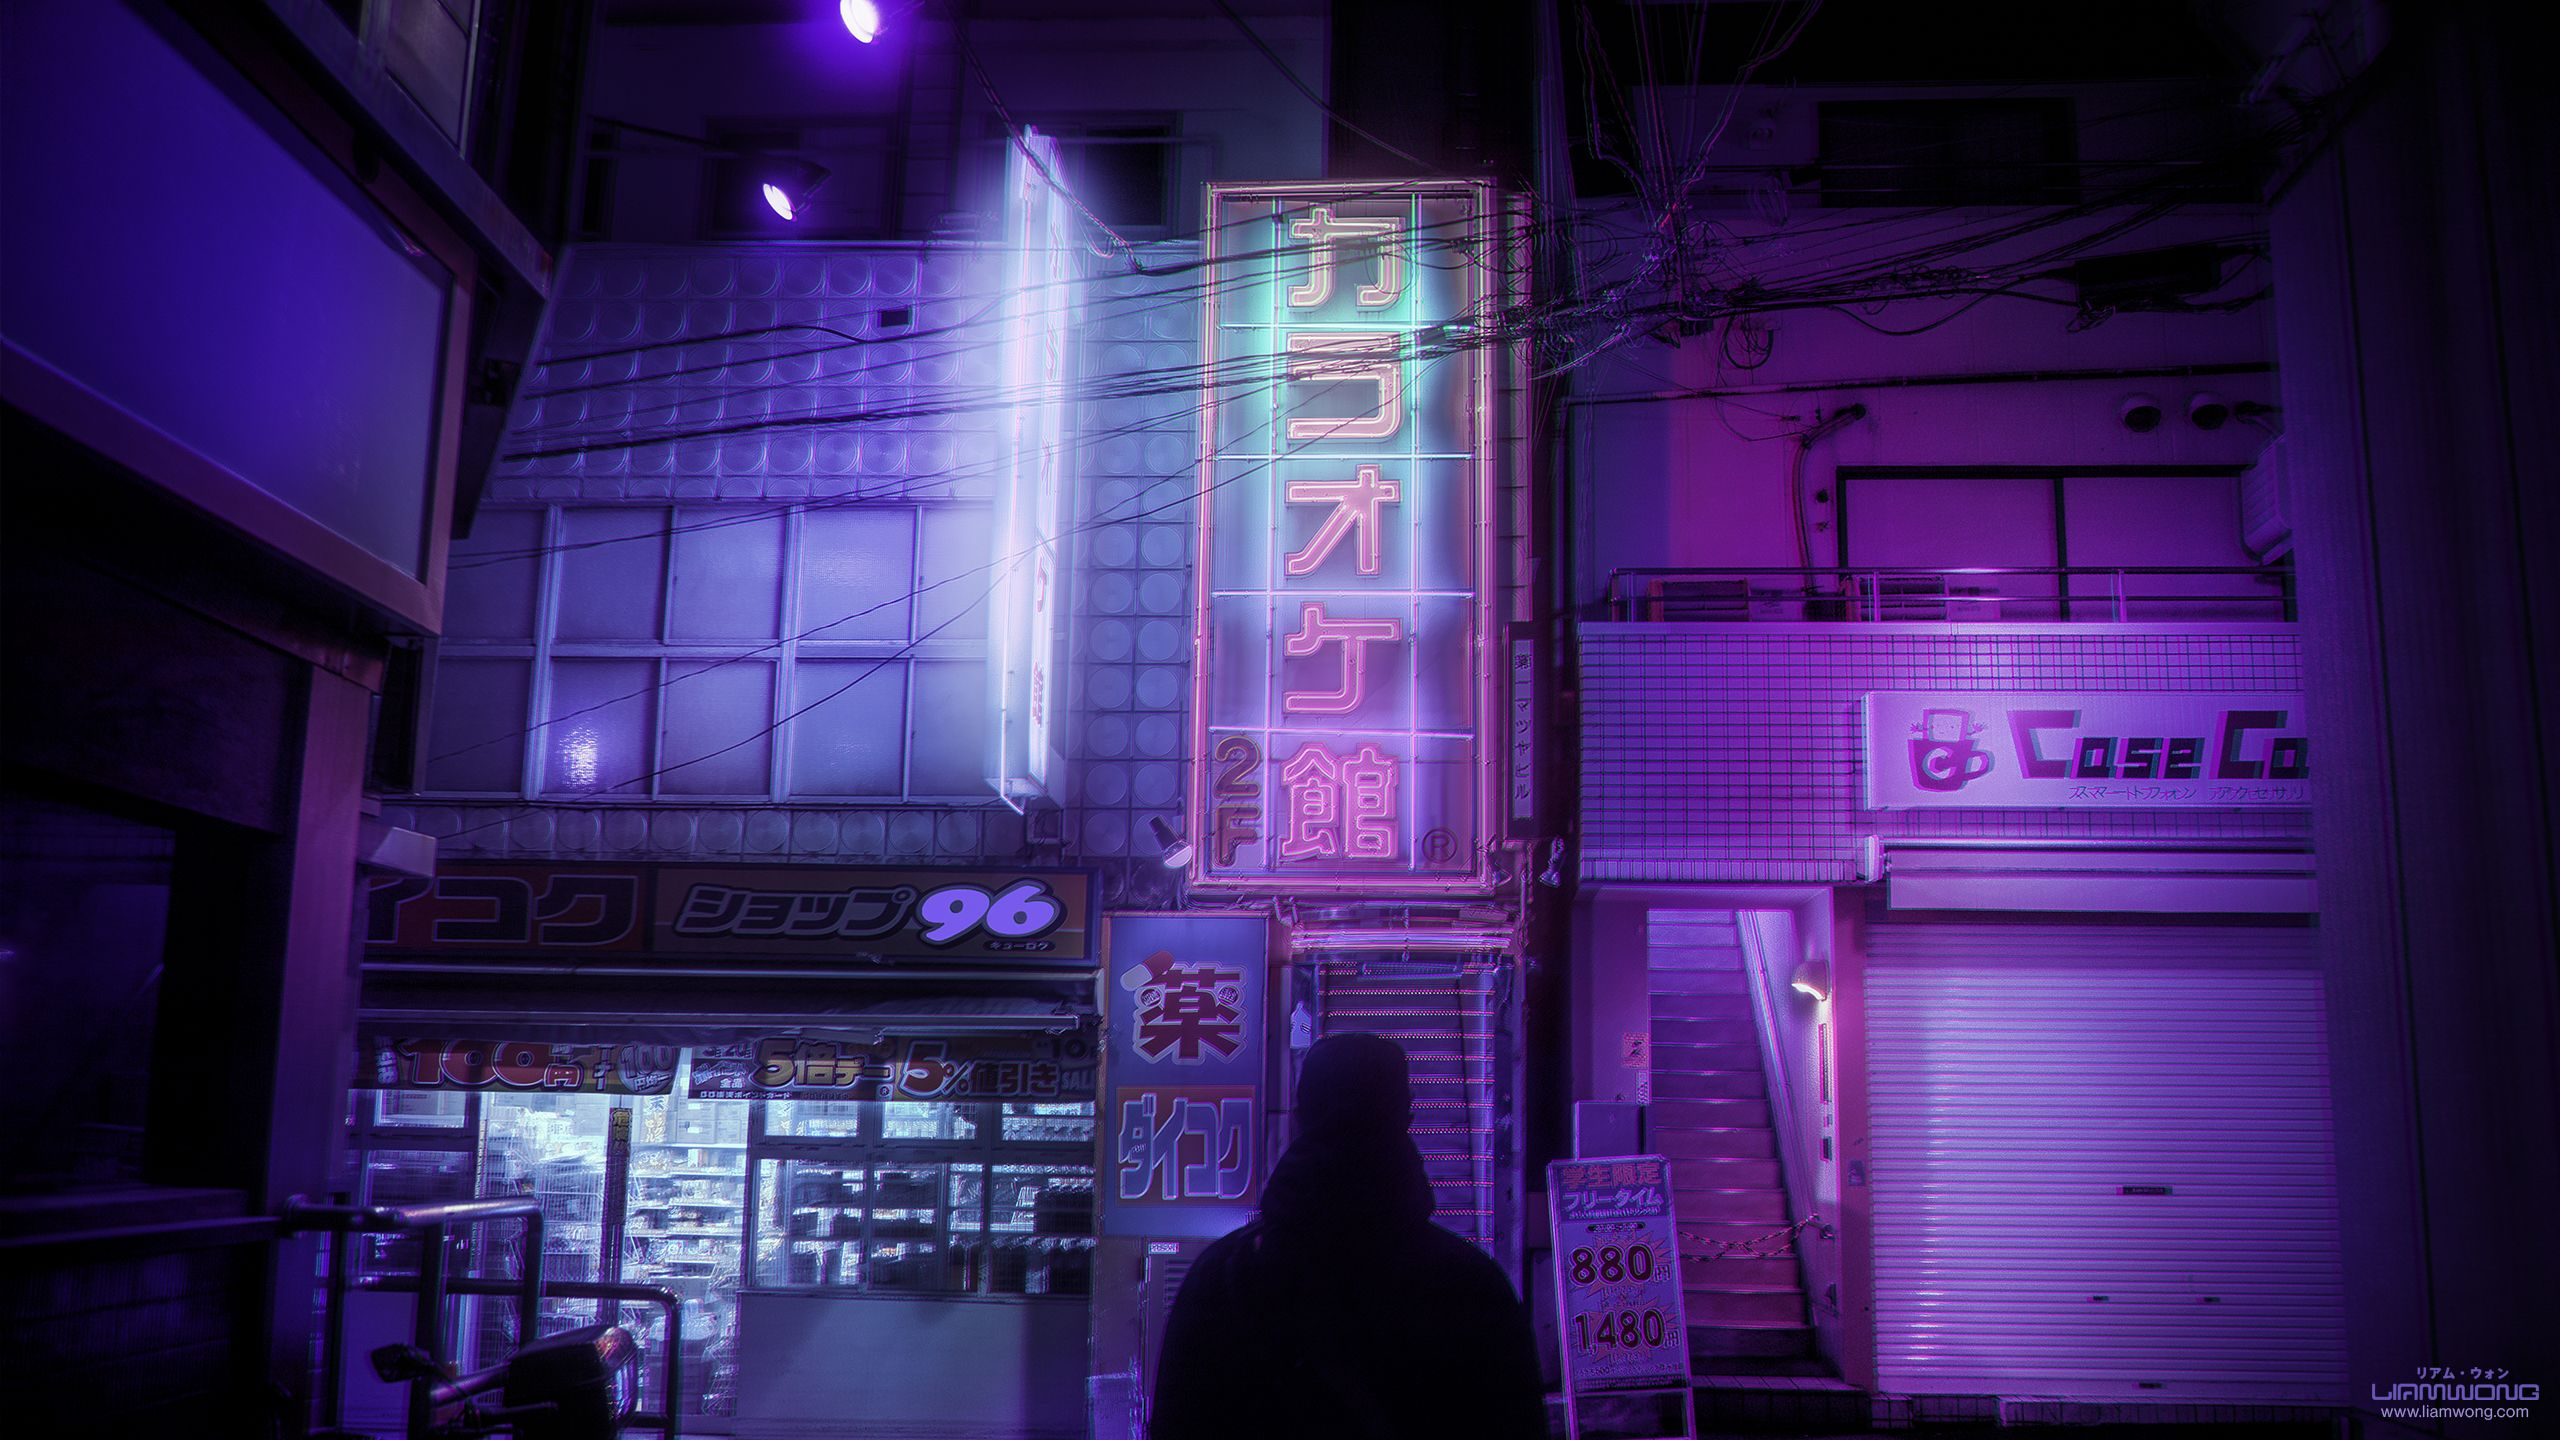 Seeking similar wallpapers, dark aesthetic with neon ...